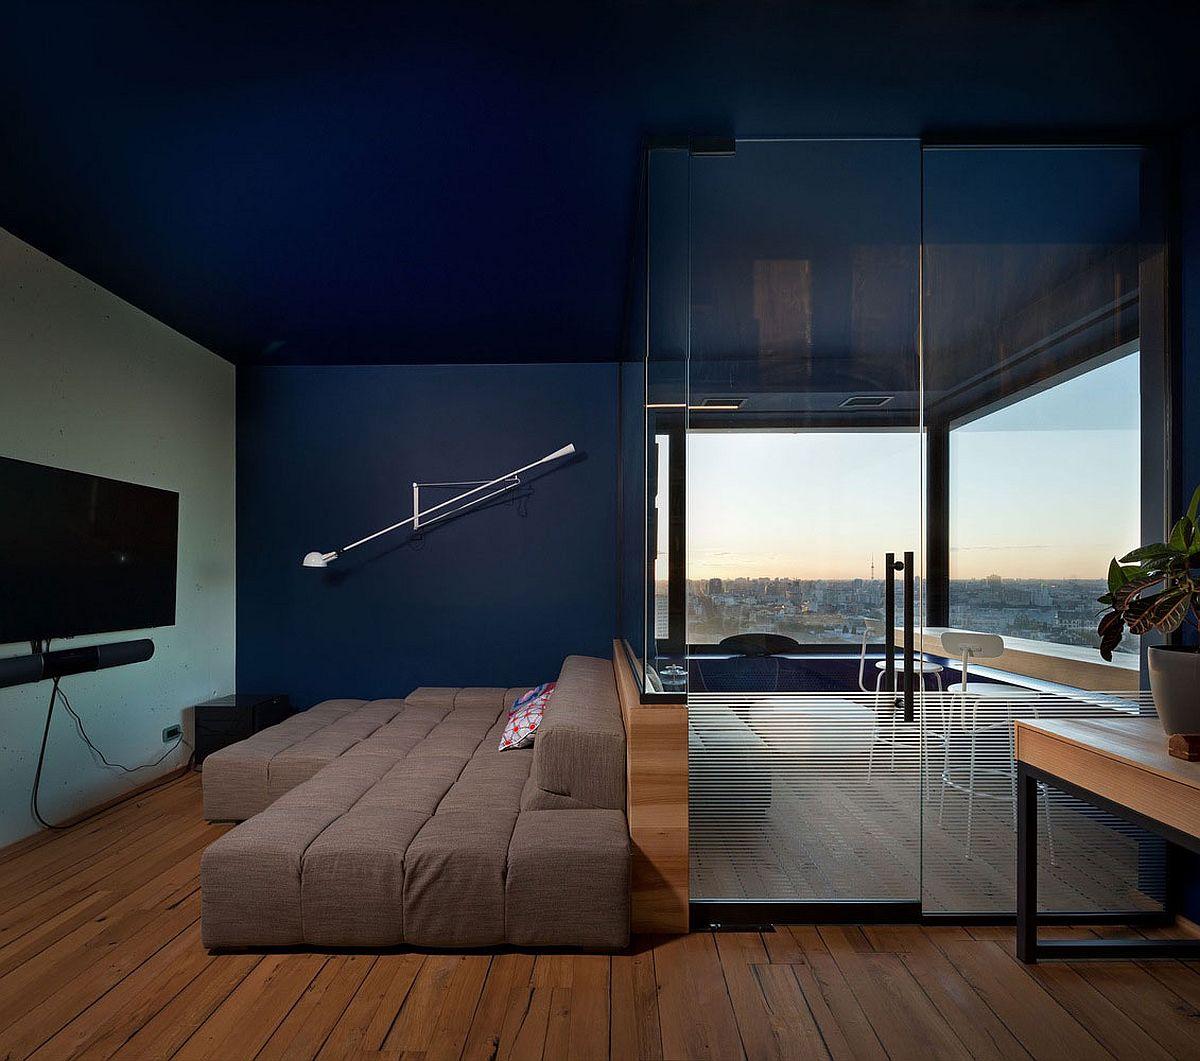 Apartment Noise Complaint  RPA Tenant Rights Blog